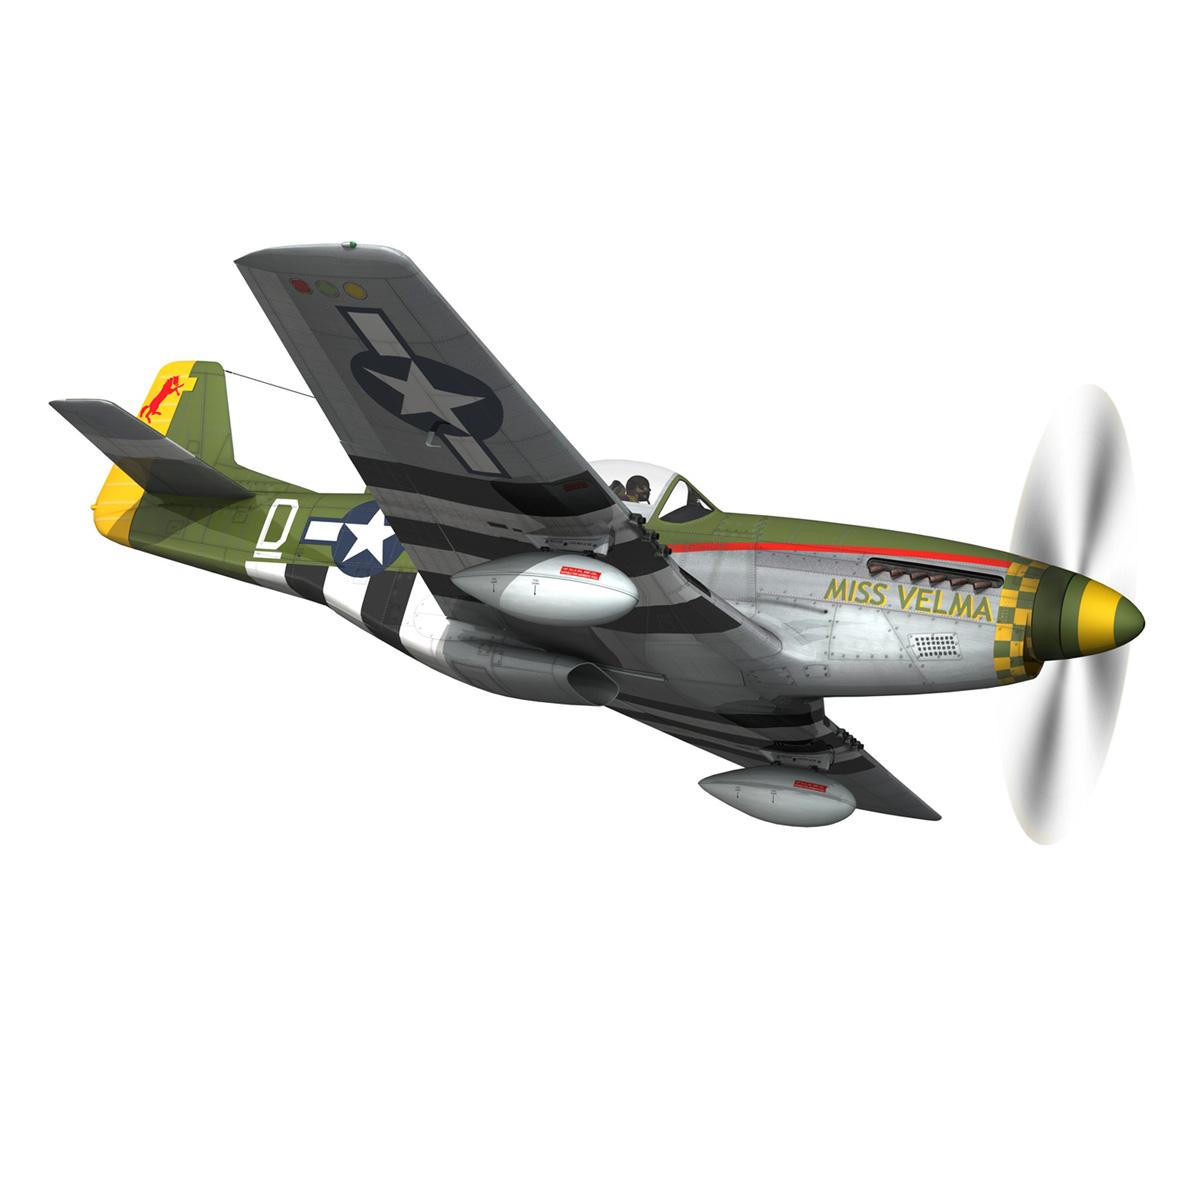 north american p-51d – mustang – miss velma 3d model 3ds fbx c4d lwo obj 267624